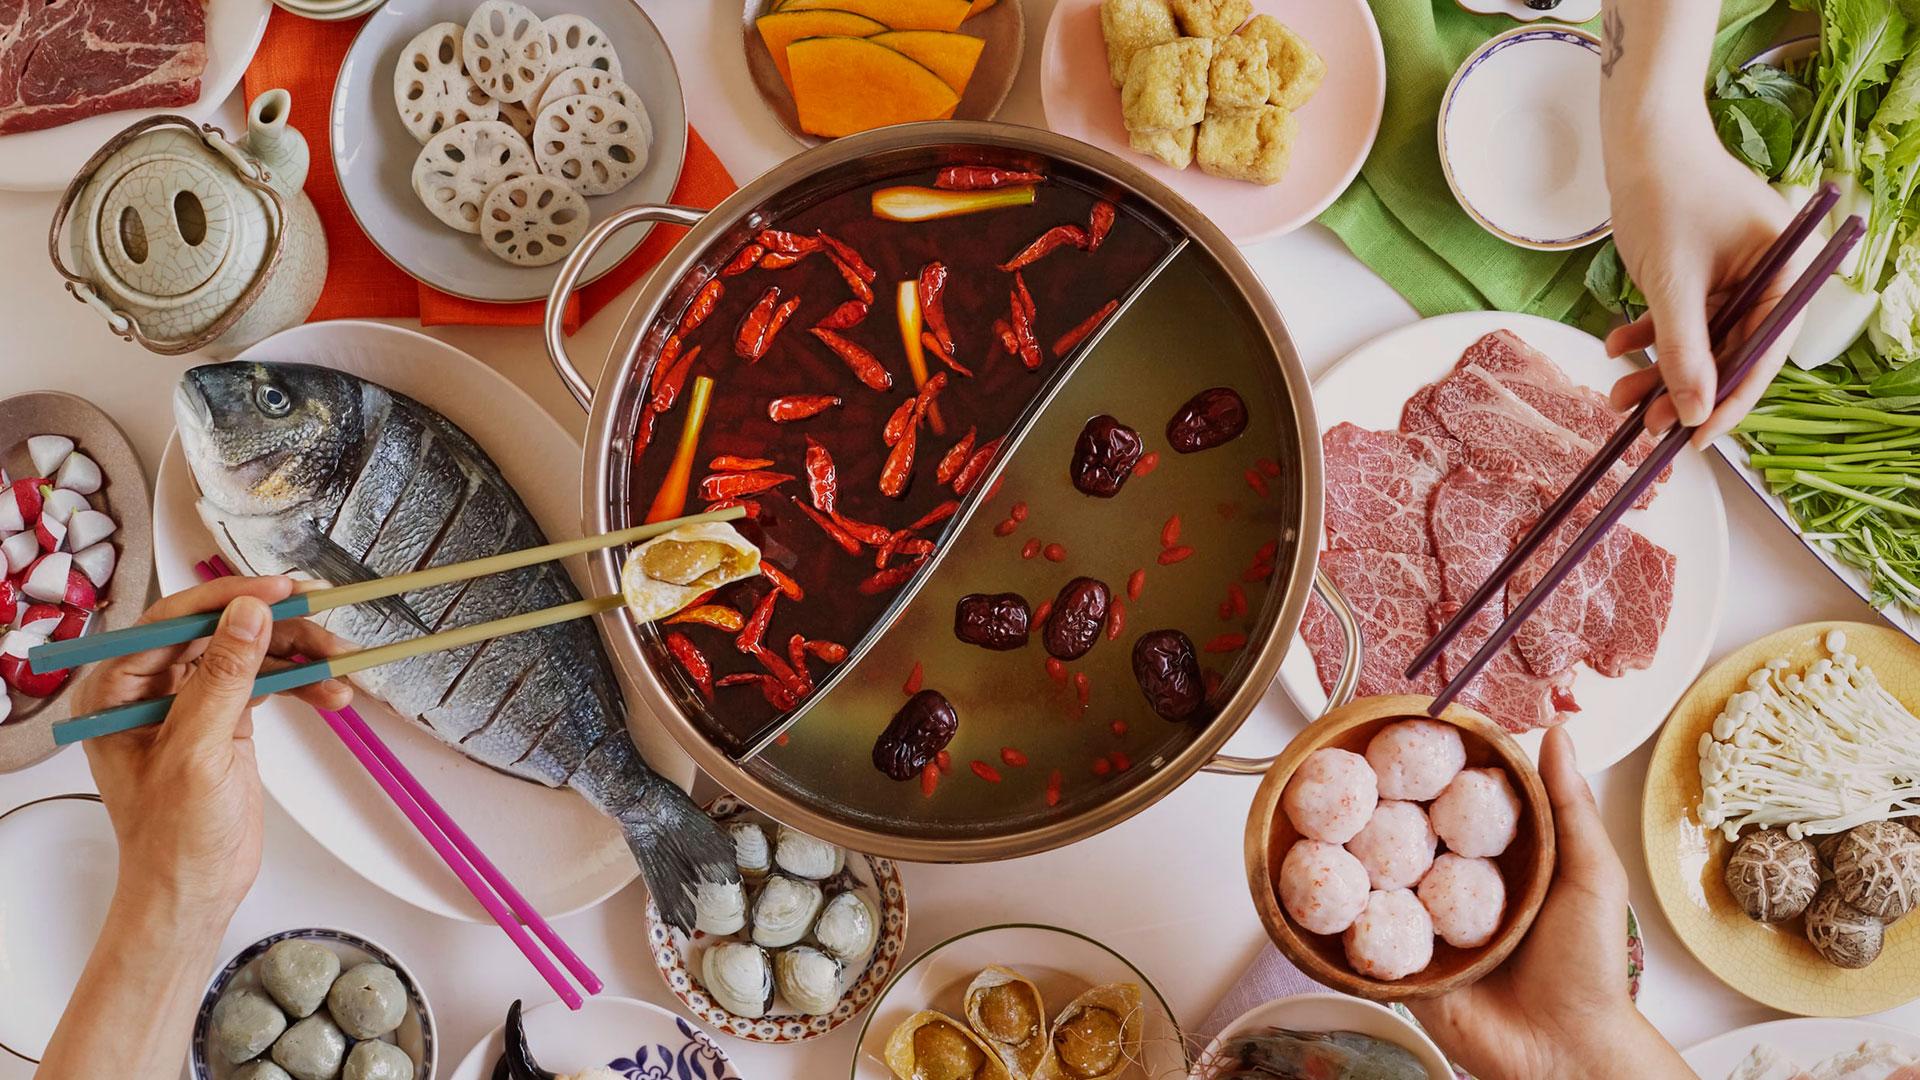 Comemos oriental hero asset